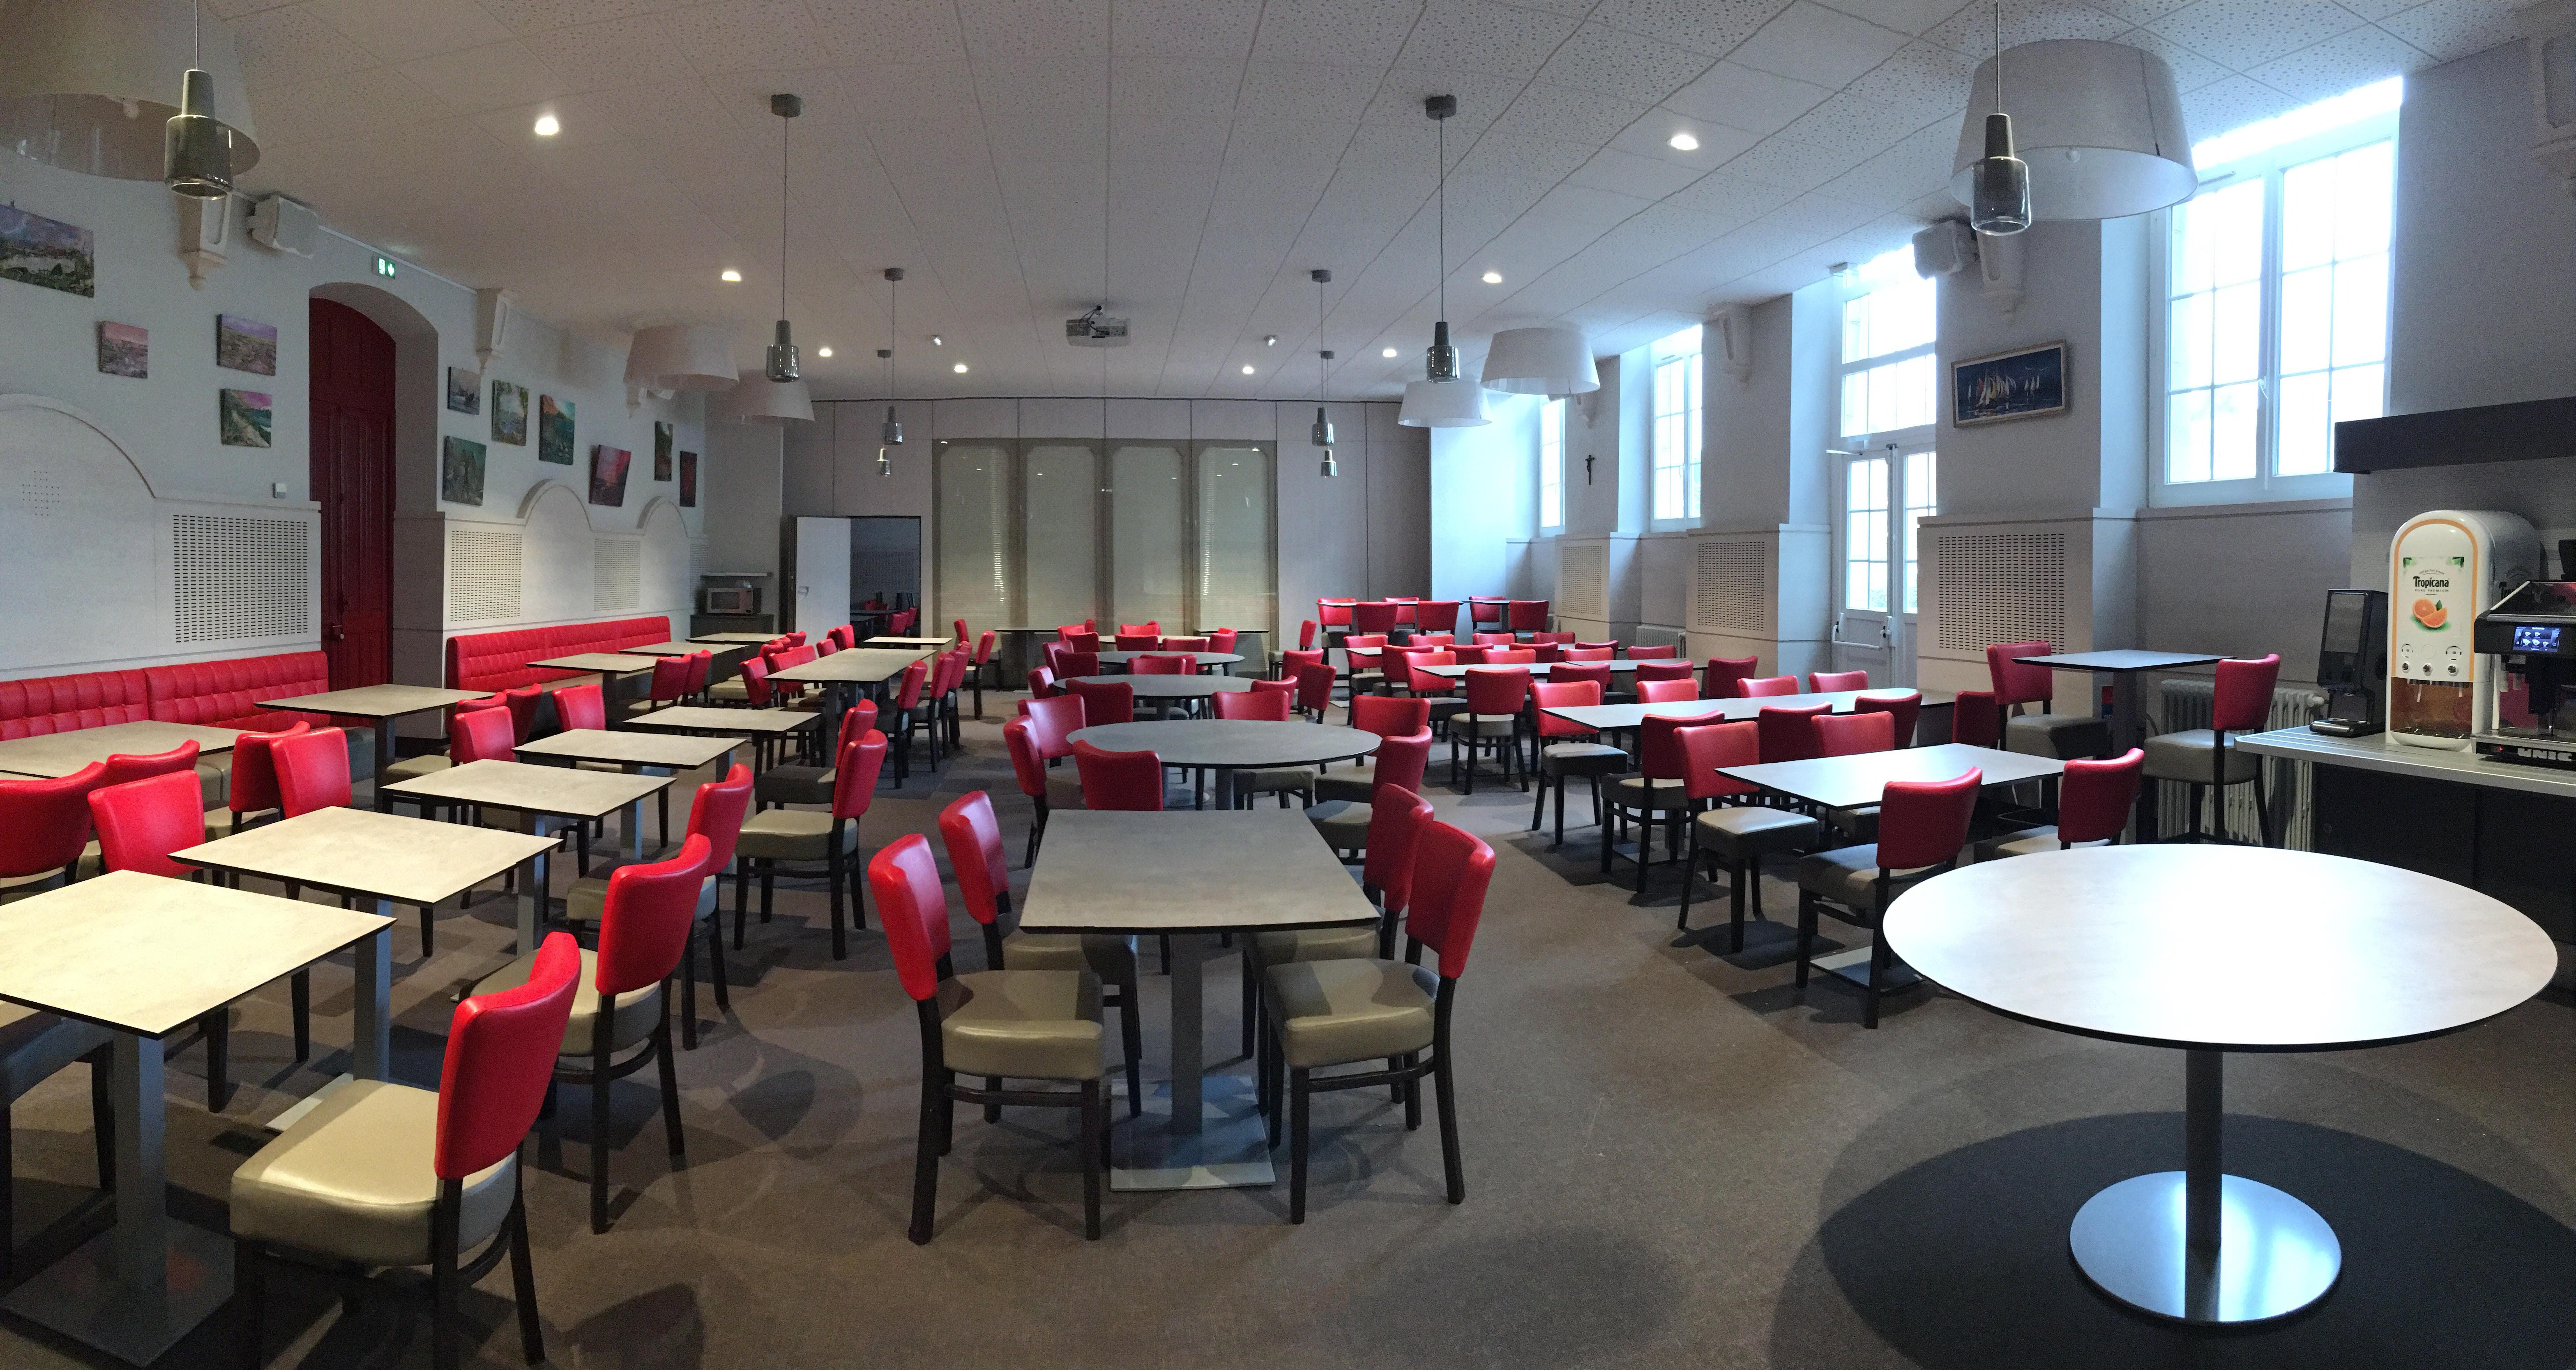 Salle n 19 grand restaurant espace montcalm for Materiel salle restaurant